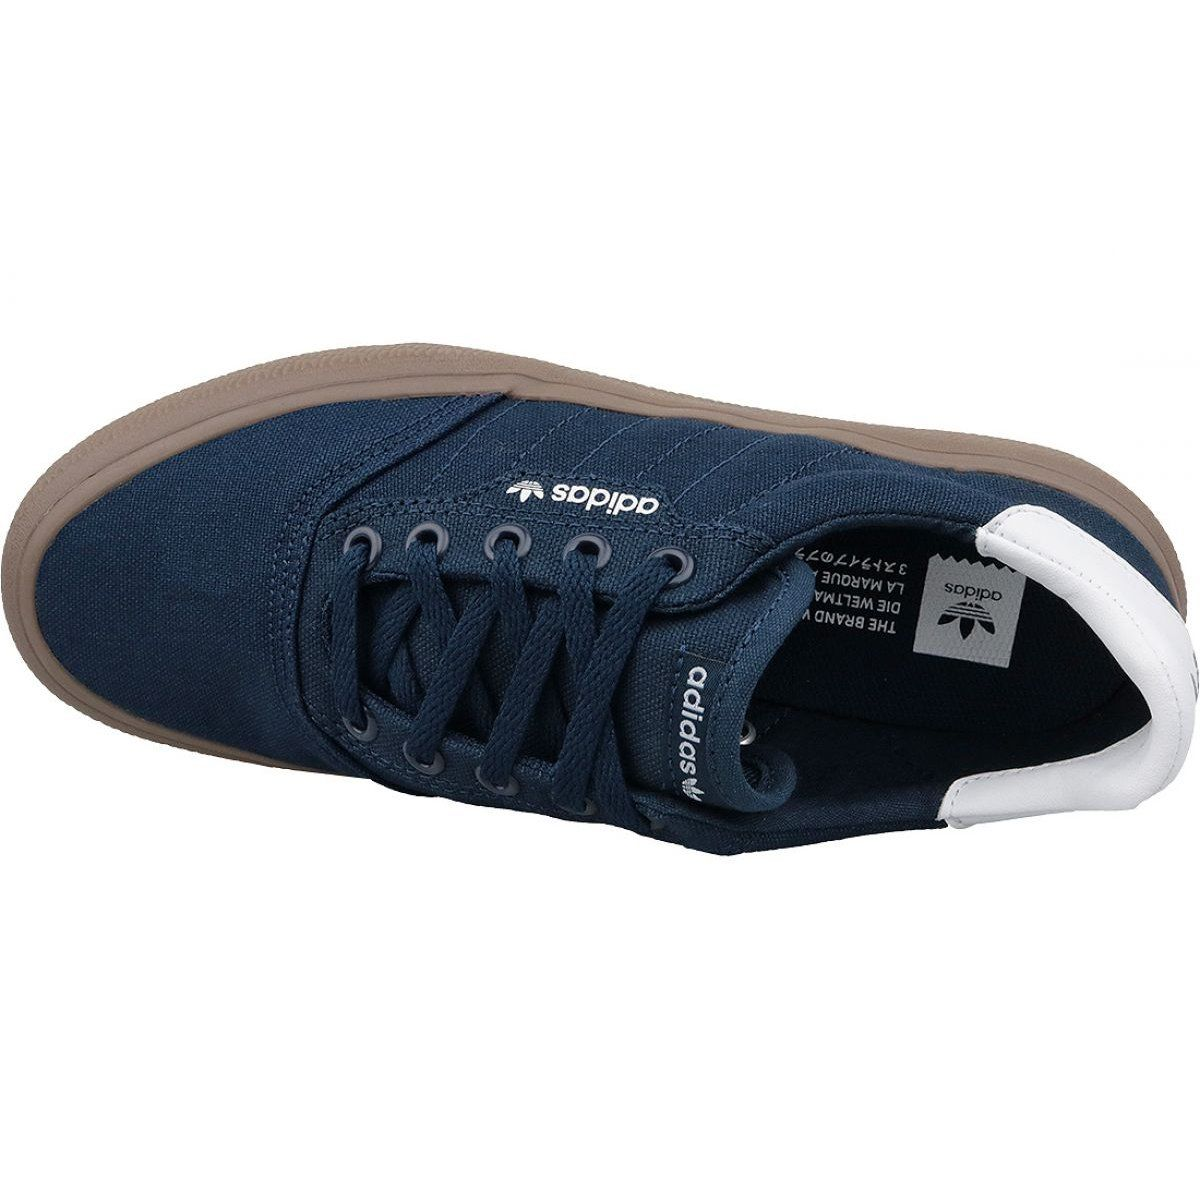 Buty Adidas 3mc M G54654 Granatowe Adidas Fashion Adidas Brand Sports Shoes Adidas